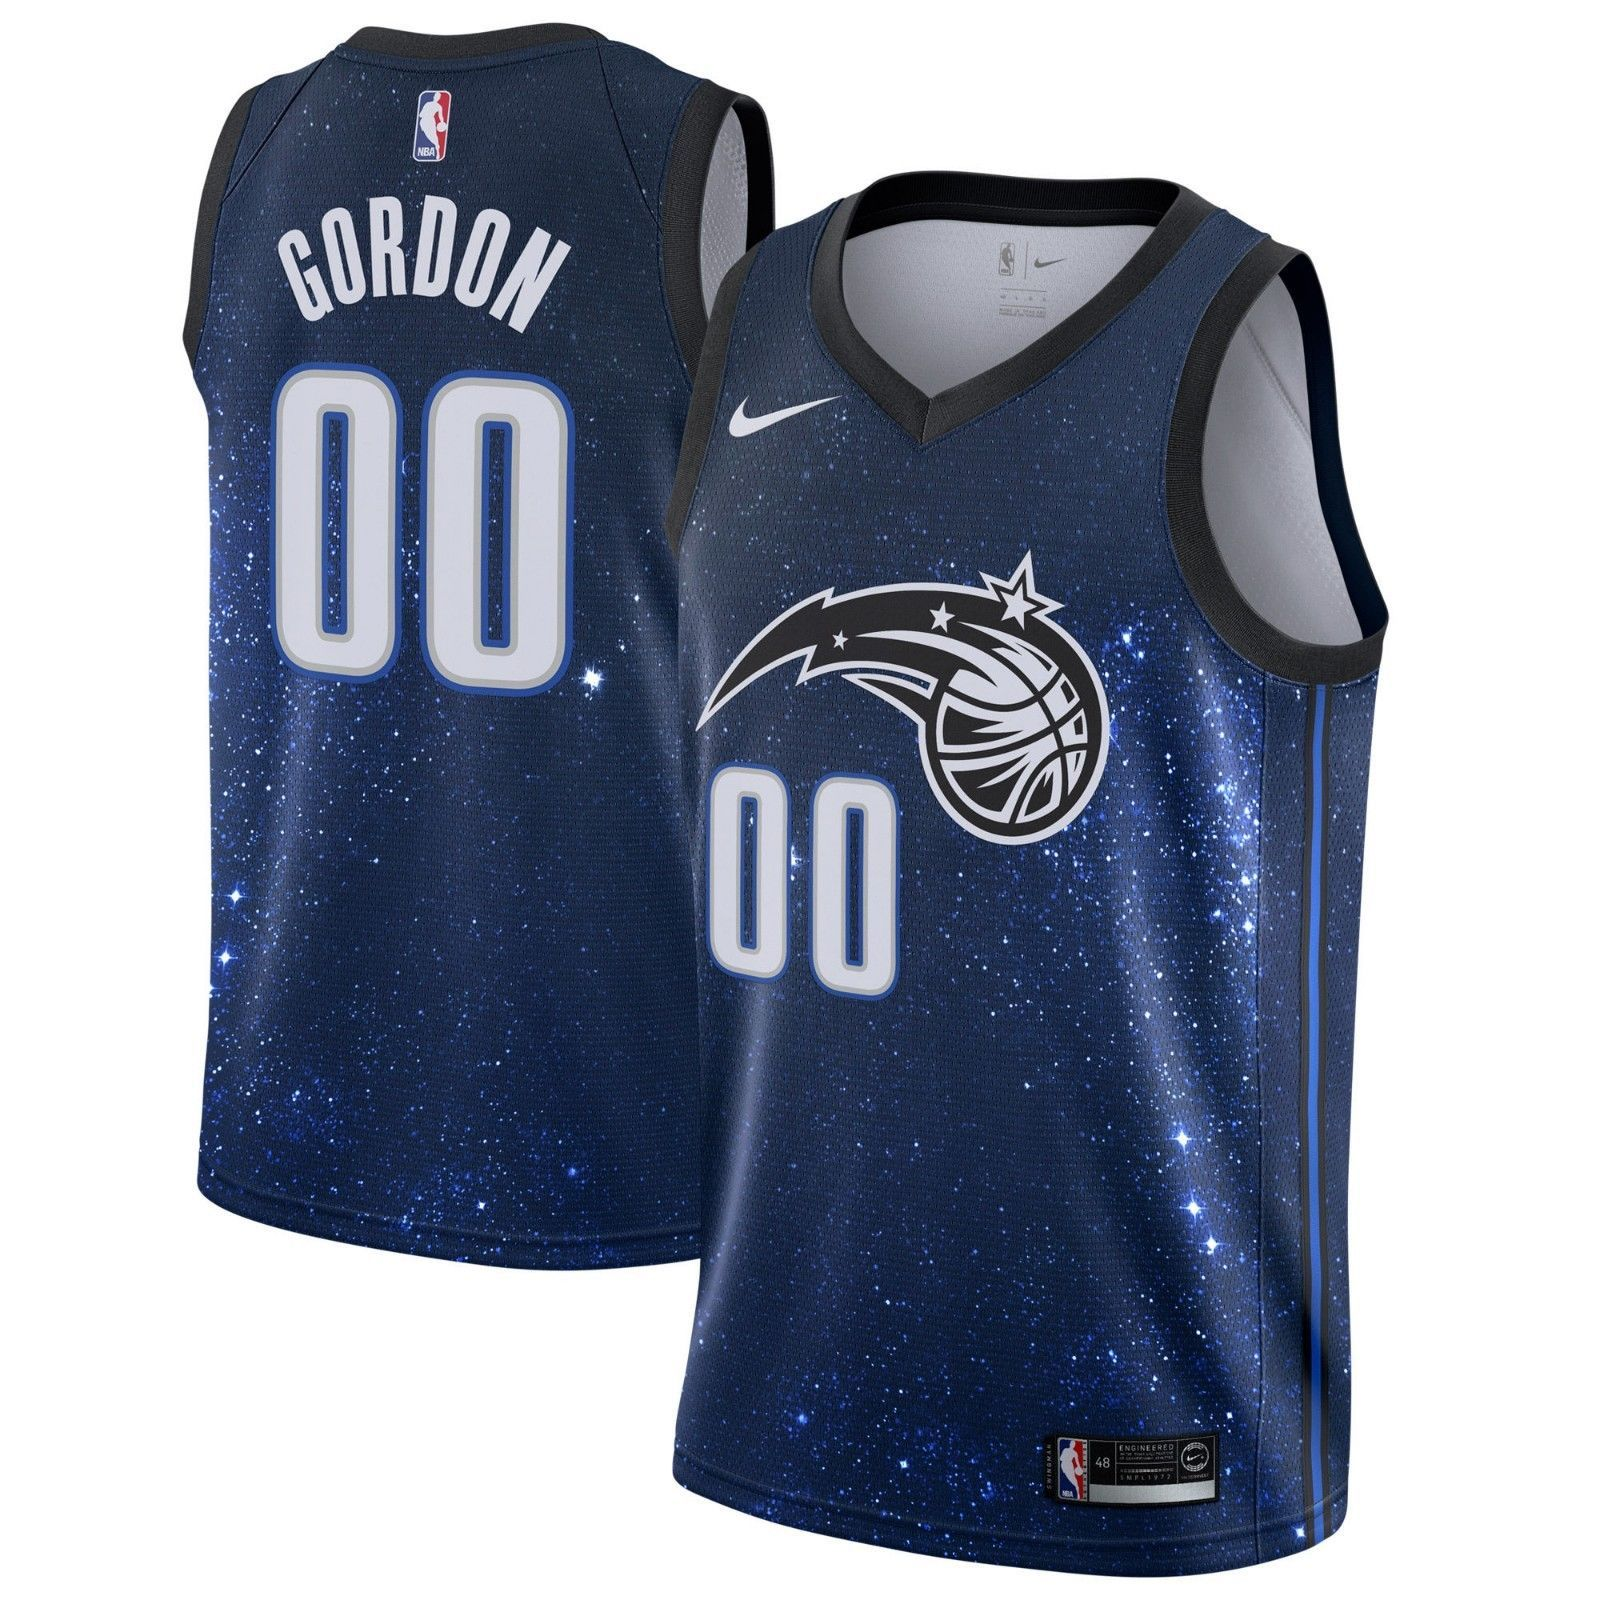 New 2017 Nike NBA Orlando Magic Aaron Gordon  00 City Edition Swingman  Jersey (eBay Link) f1254f78b